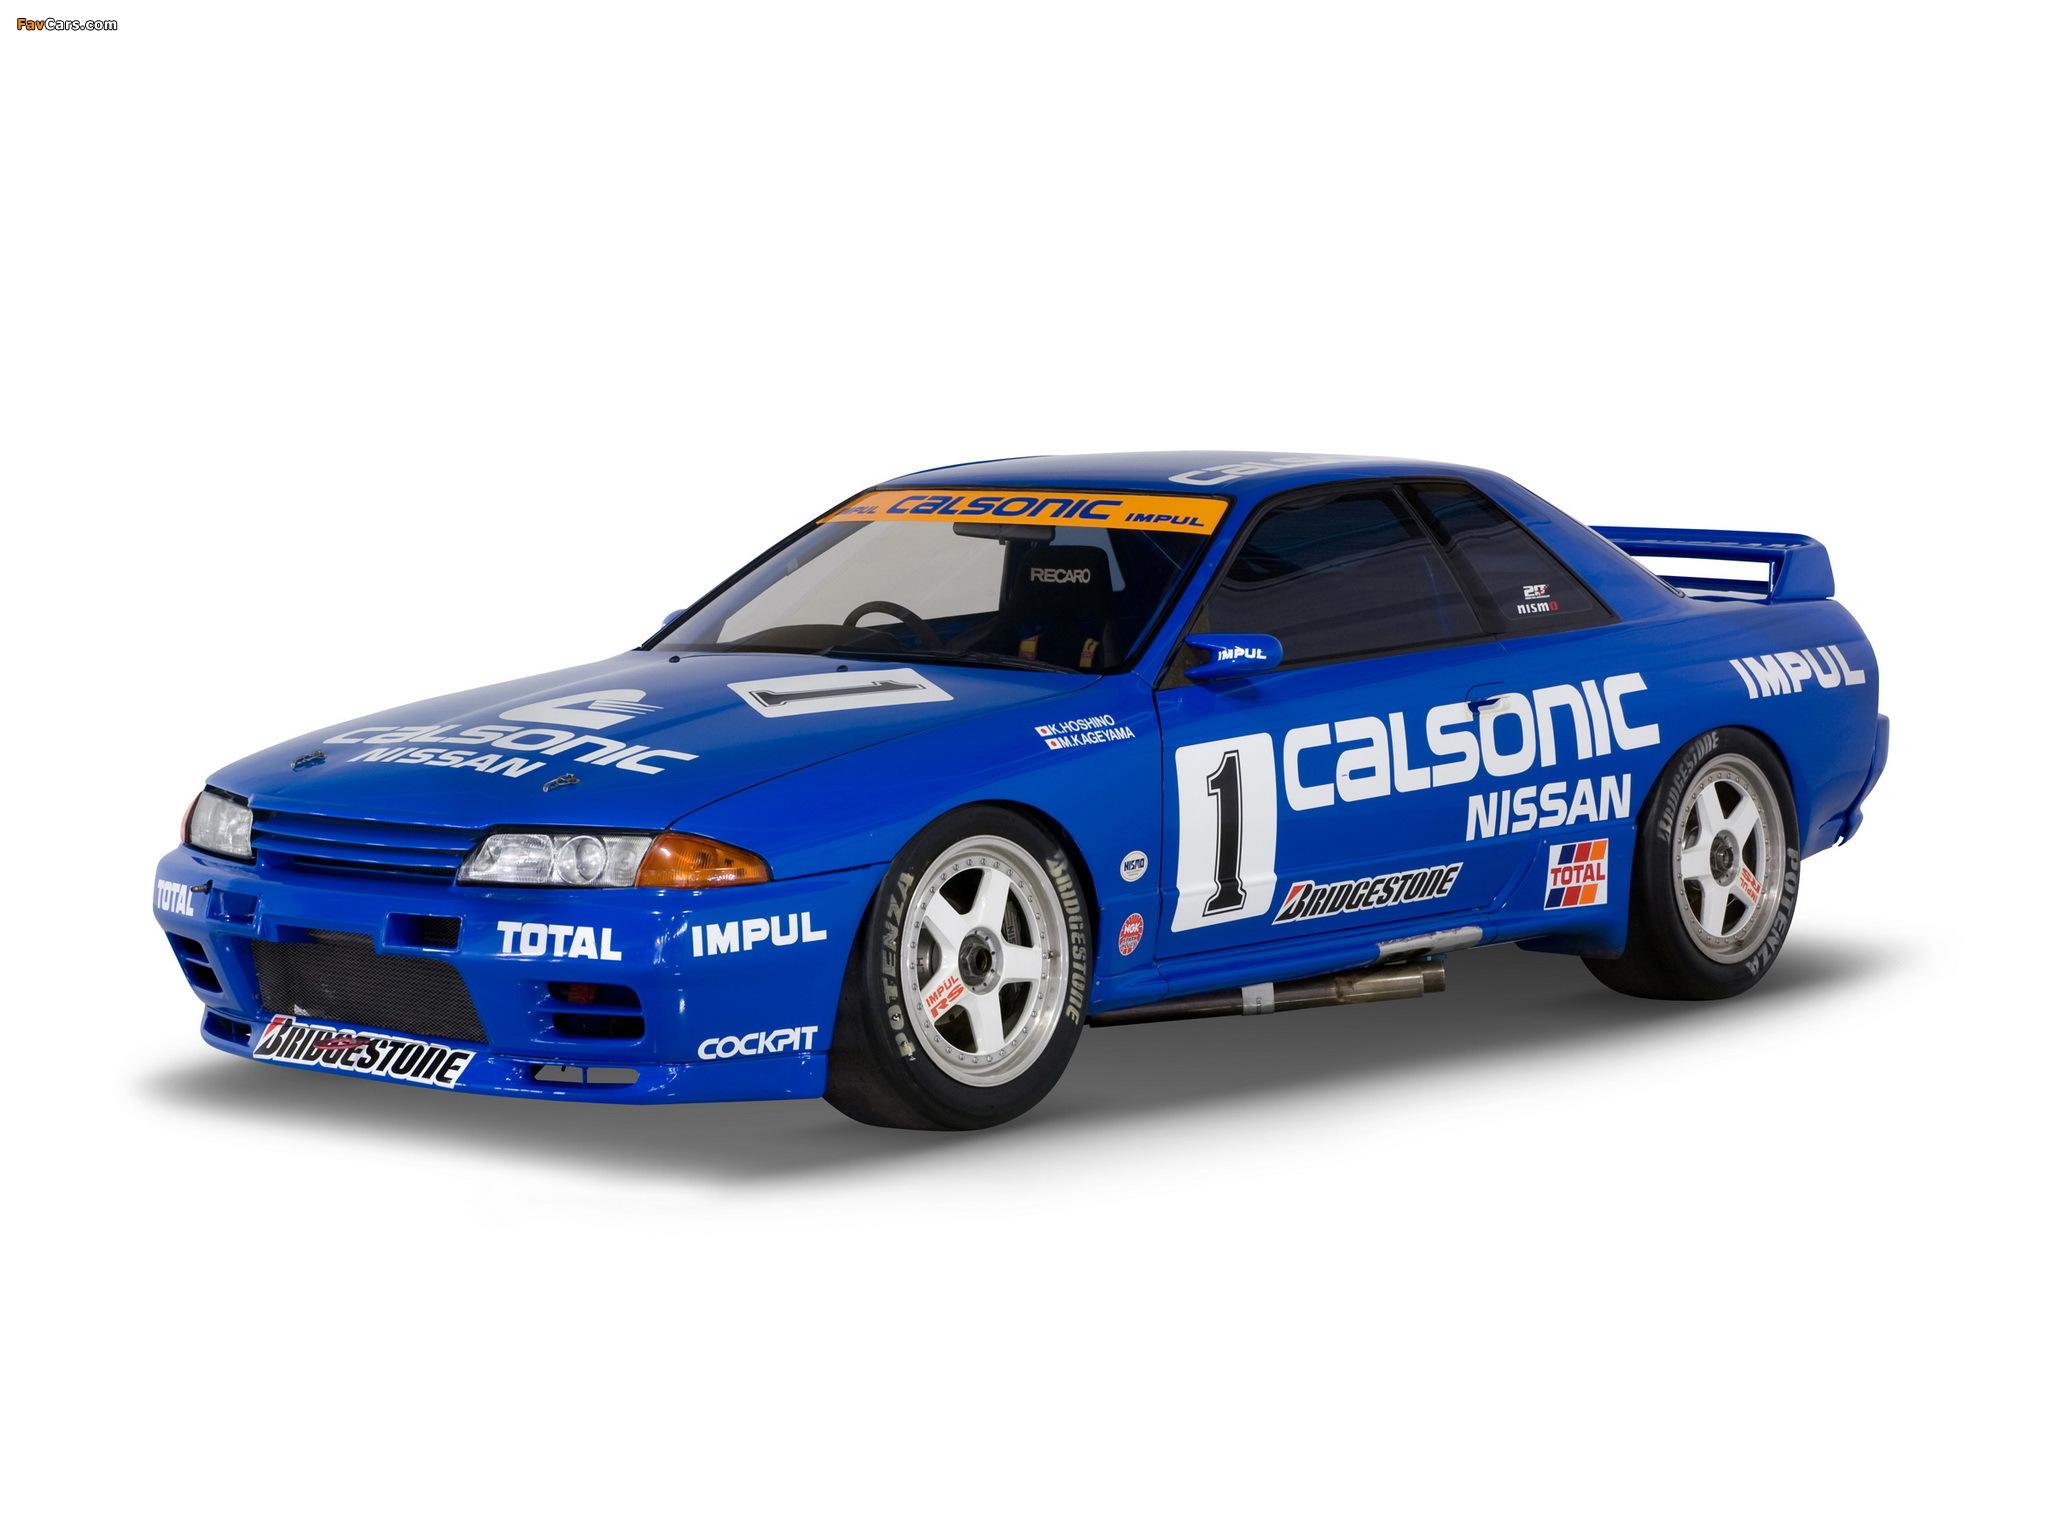 Nissan Skyline Gt R Jgtc Race Car R32 1989 93 Pictures